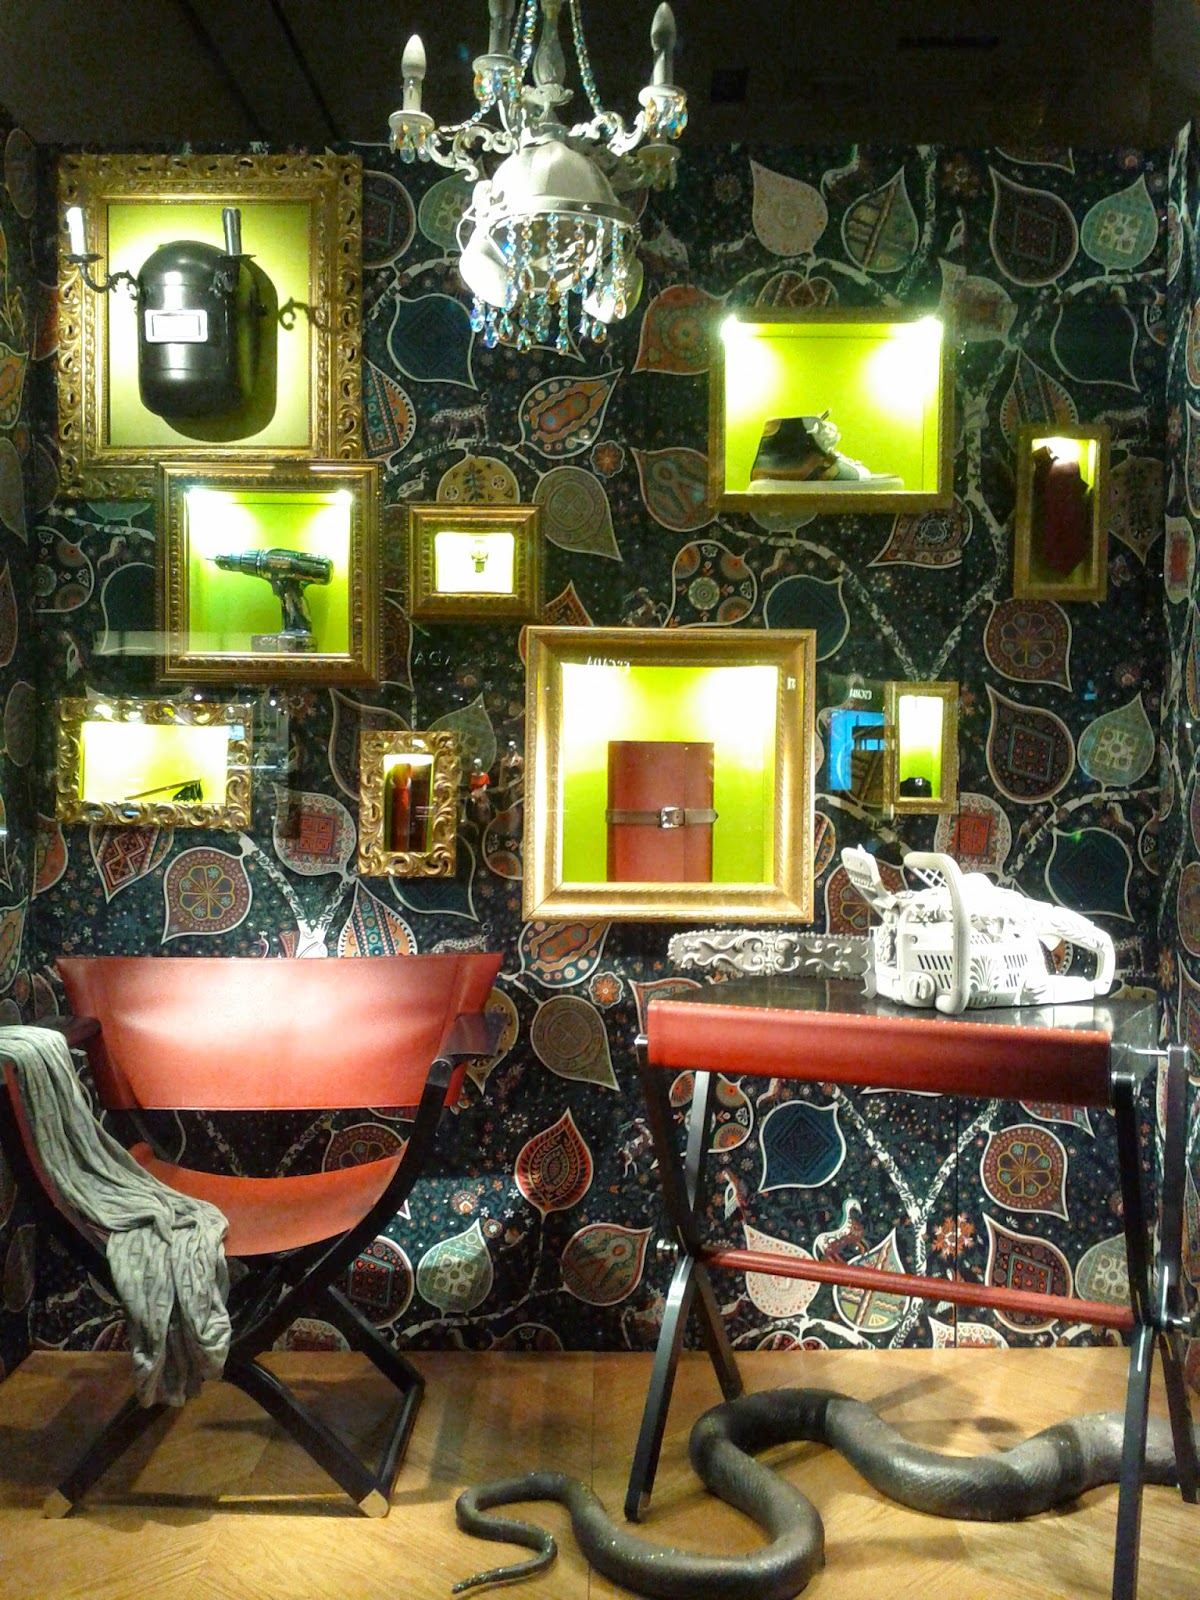 Hermes beatiful living room set (Bay and Bloor)